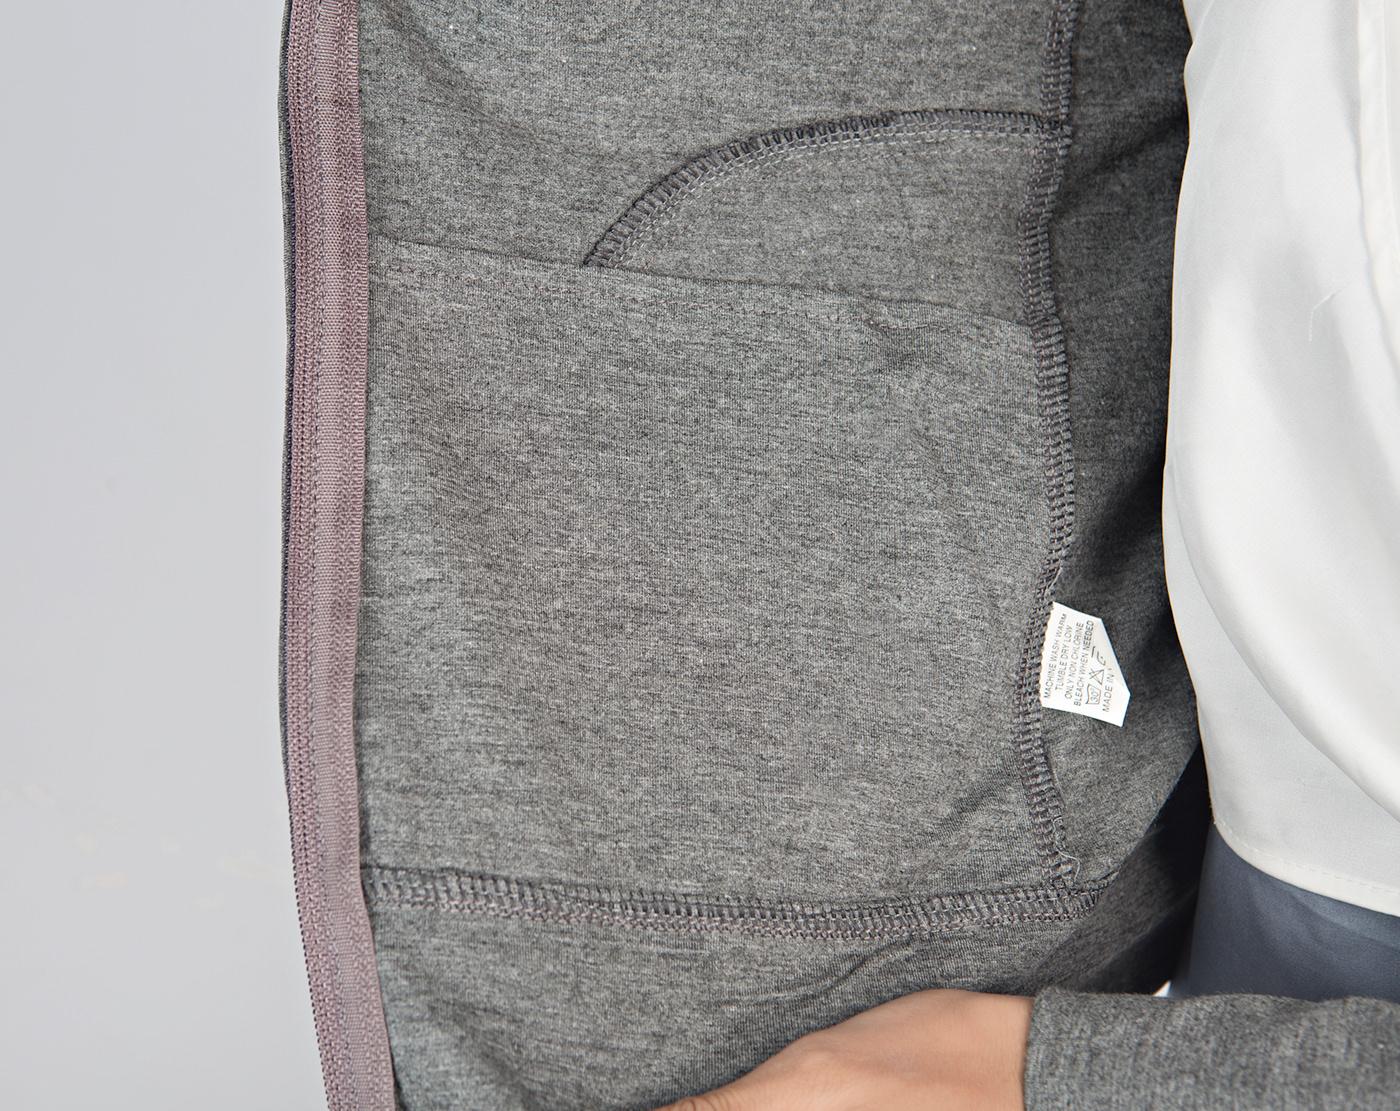 Image may contain: person, pocket and bag